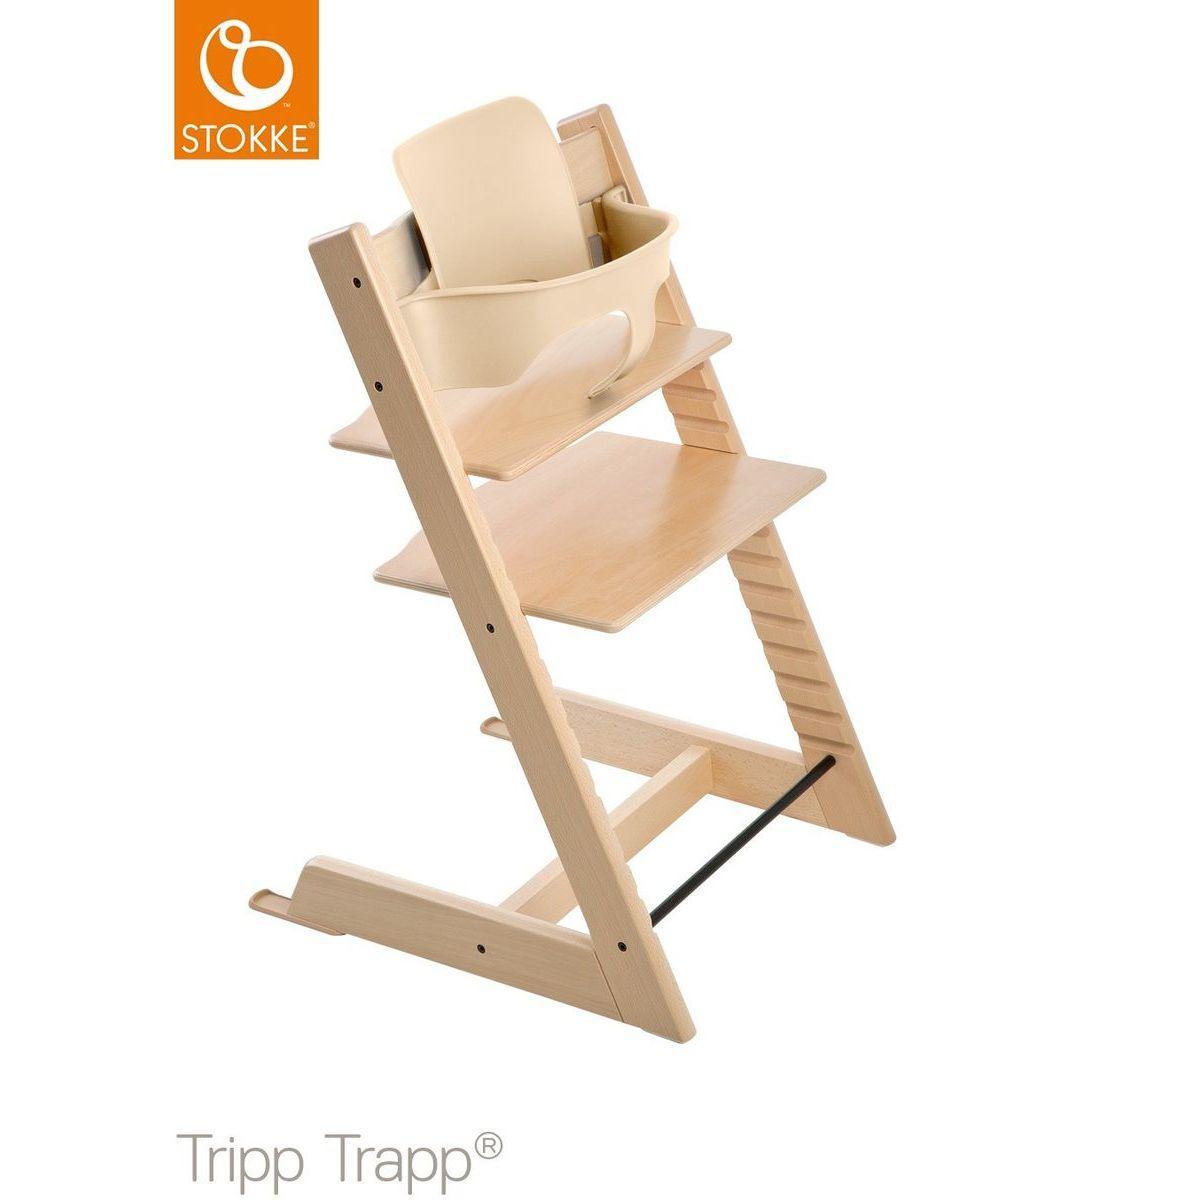 Trona bebé TRIPP TRAPP Stokke natural